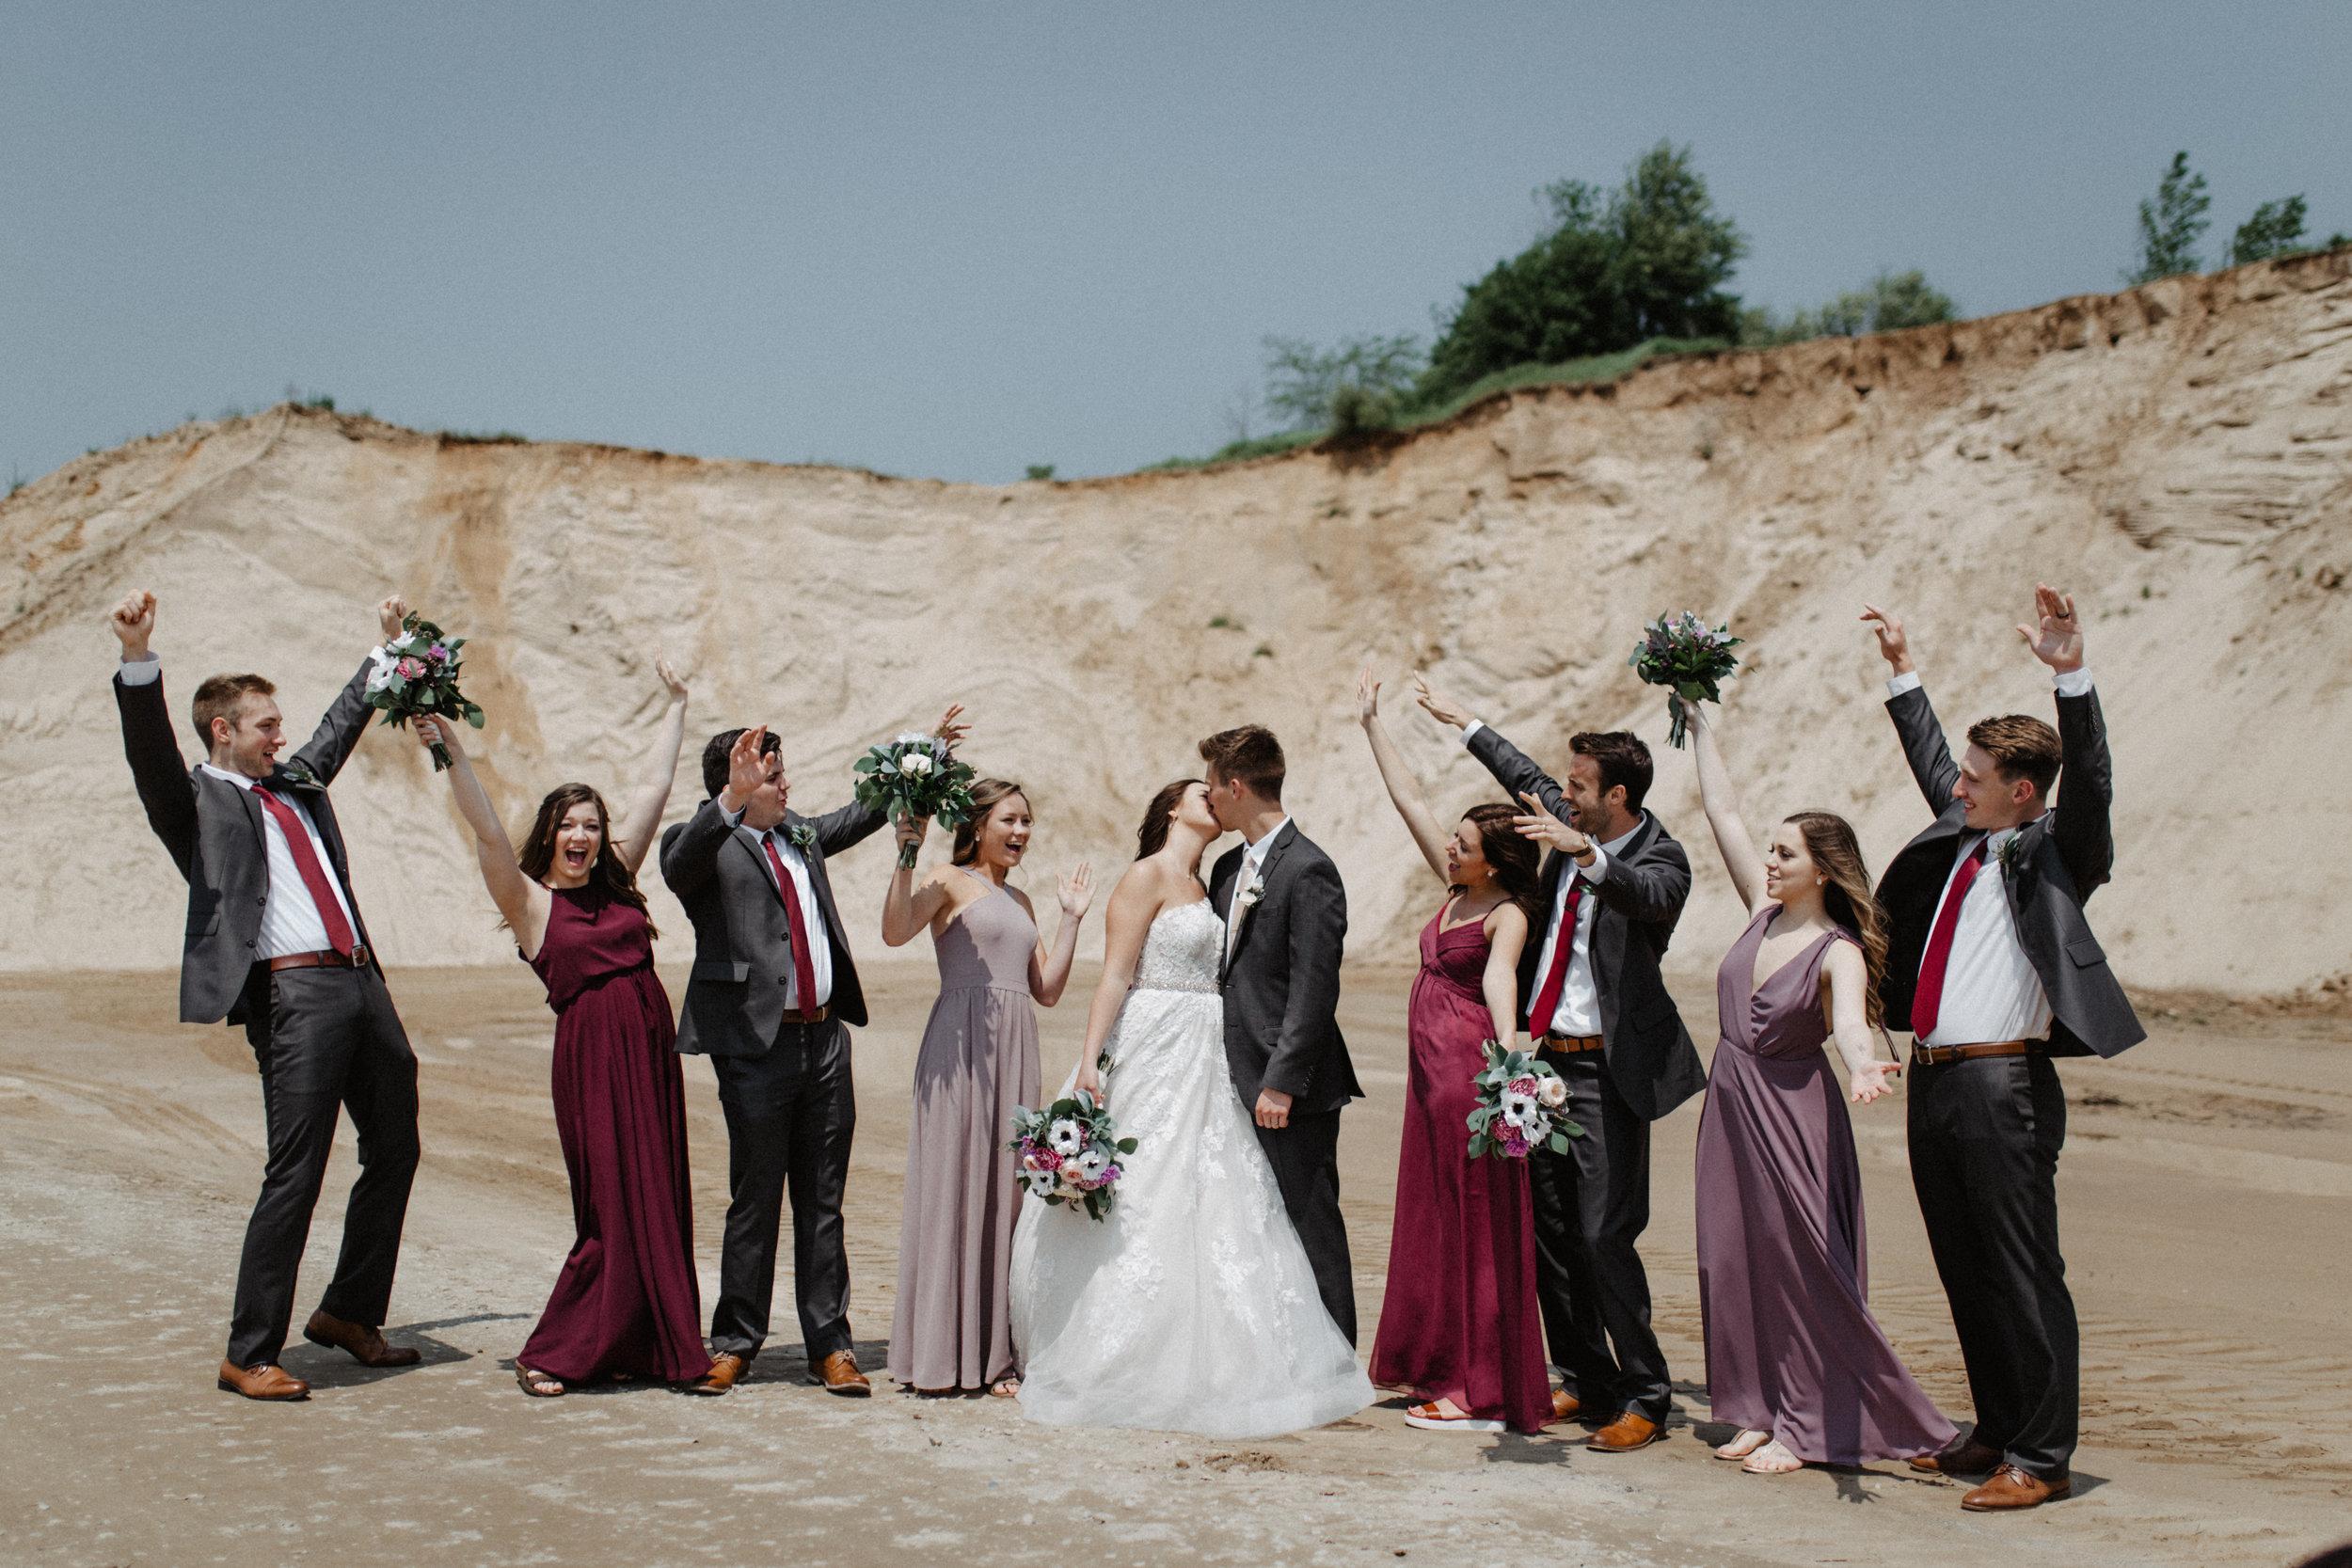 GRAYCENTOMHAMILTON-GRAND-RAPIDS-WEDDING-PHOTOGRAPHY-33.jpg